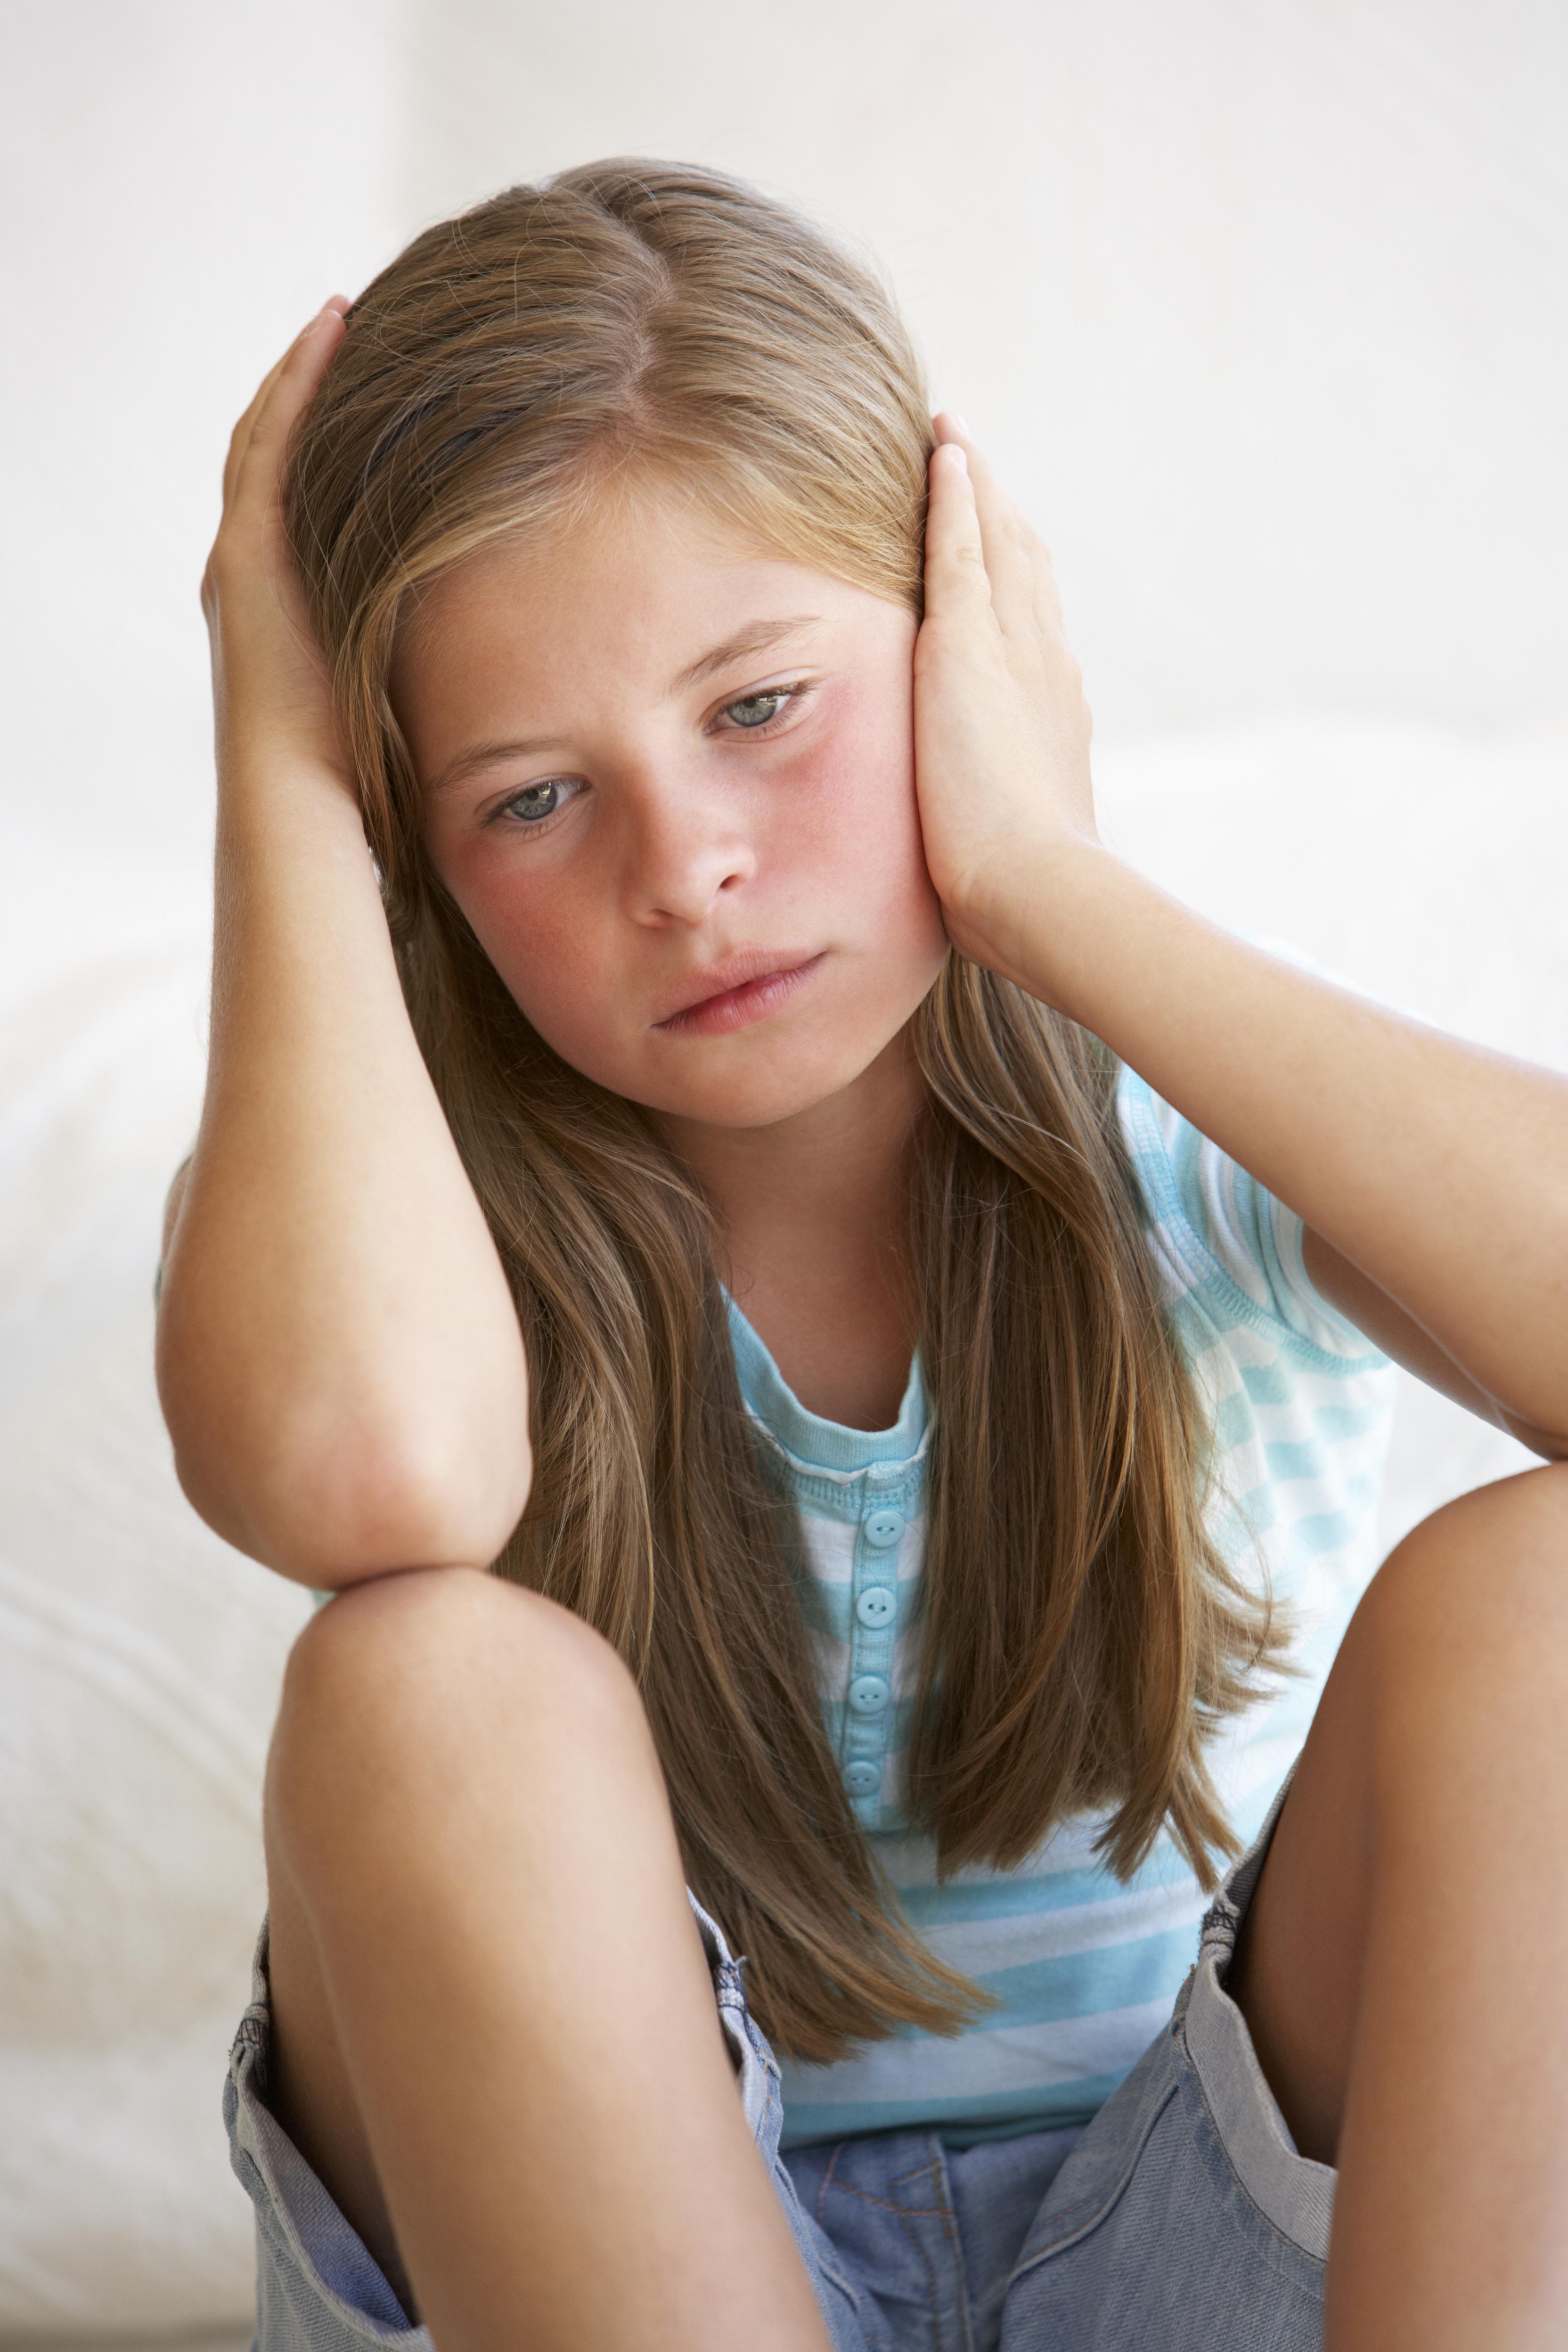 Helping Children Through Chronic Illness